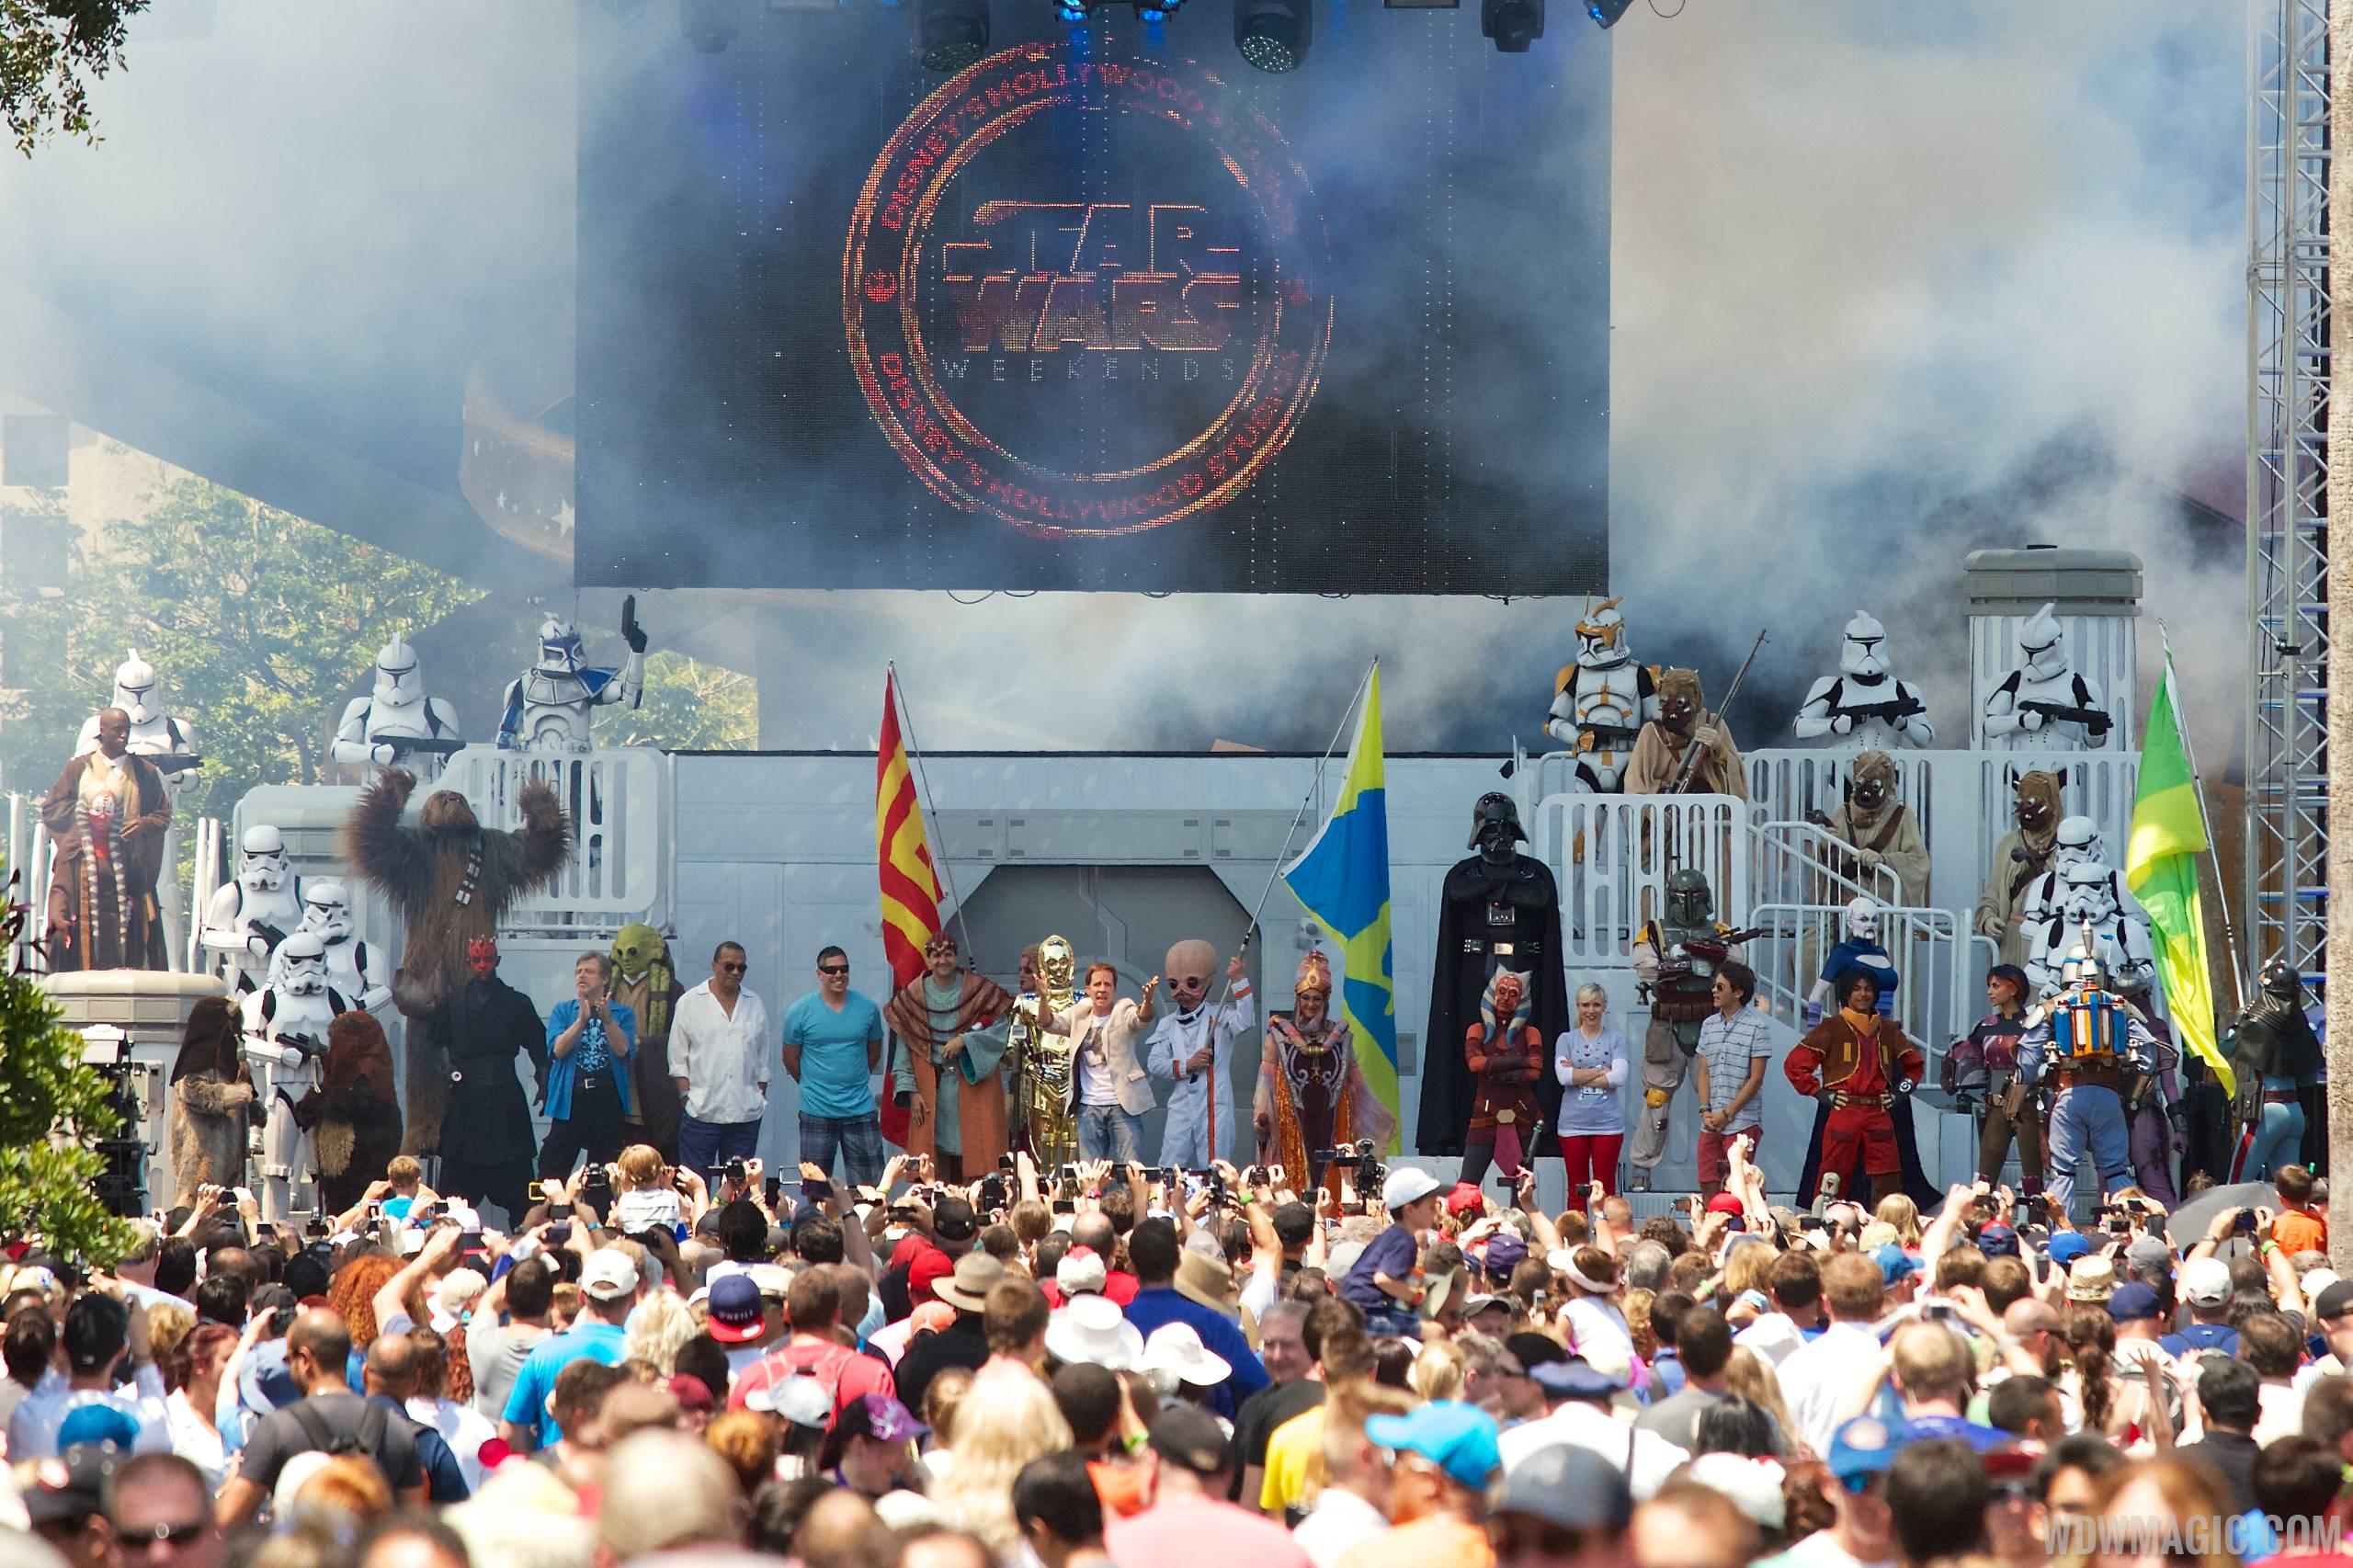 2014 Star Wars Weekends - Weekend 4 Legends of the Force motorcade celebrities - On Stage Welcome